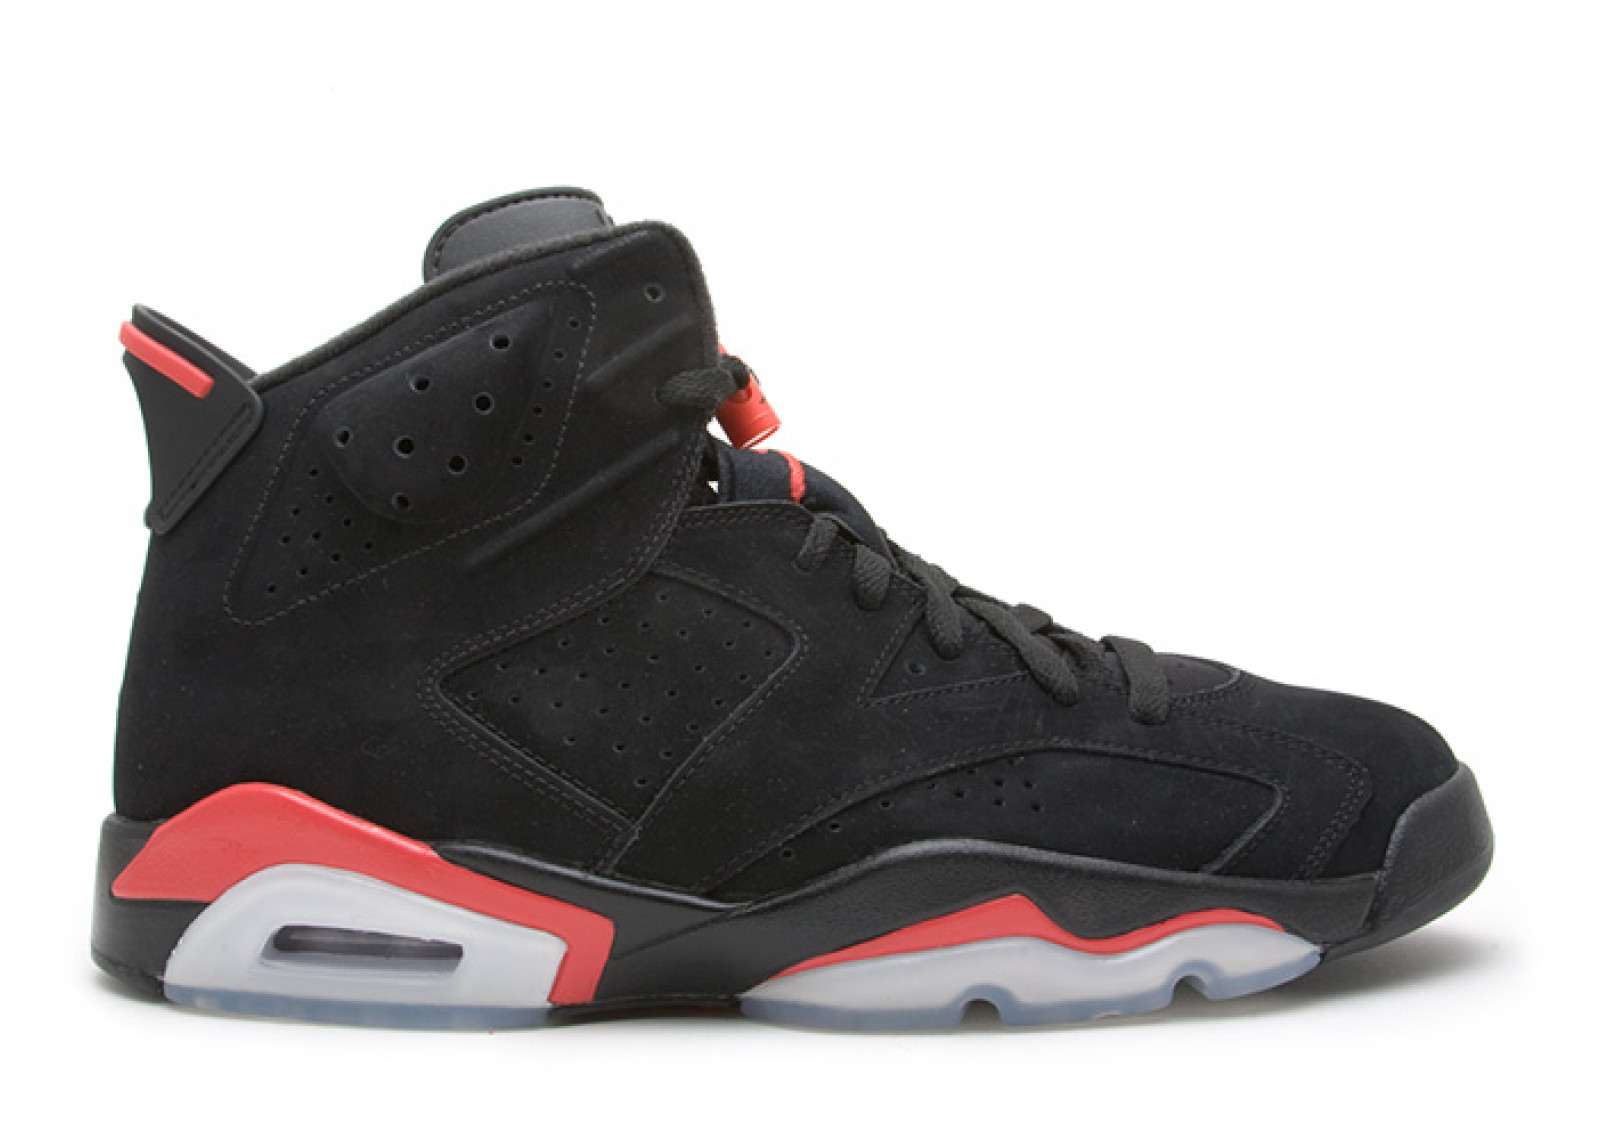 Jordan 6 Retro Infrared Pack Black